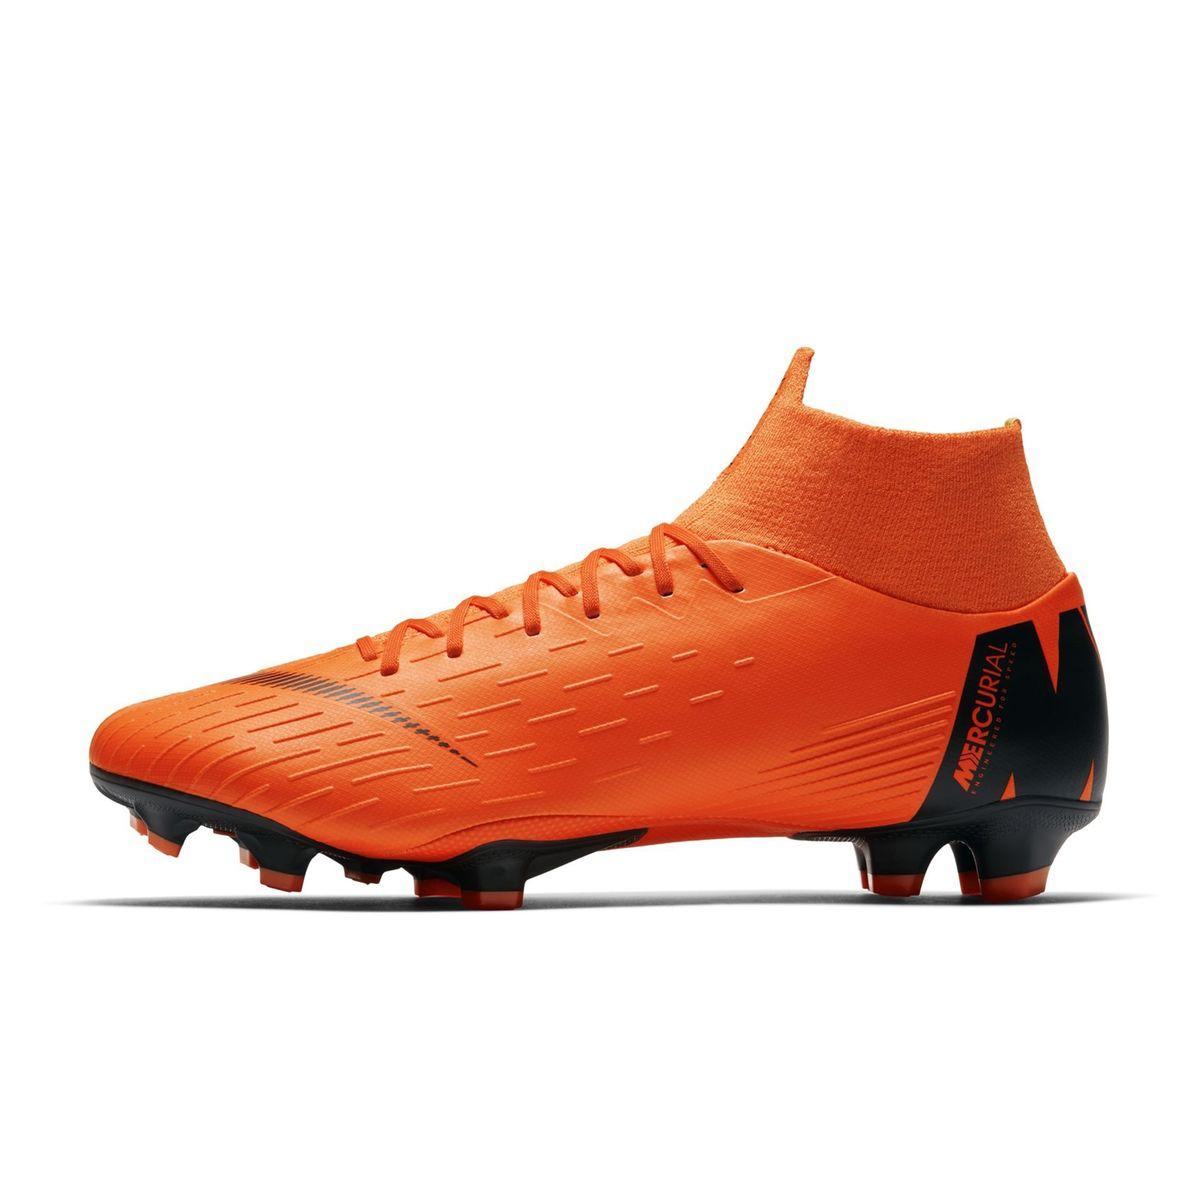 magasin en ligne 9086d b2523 Chaussures football Chaussure de Football Nike Mercurial ...